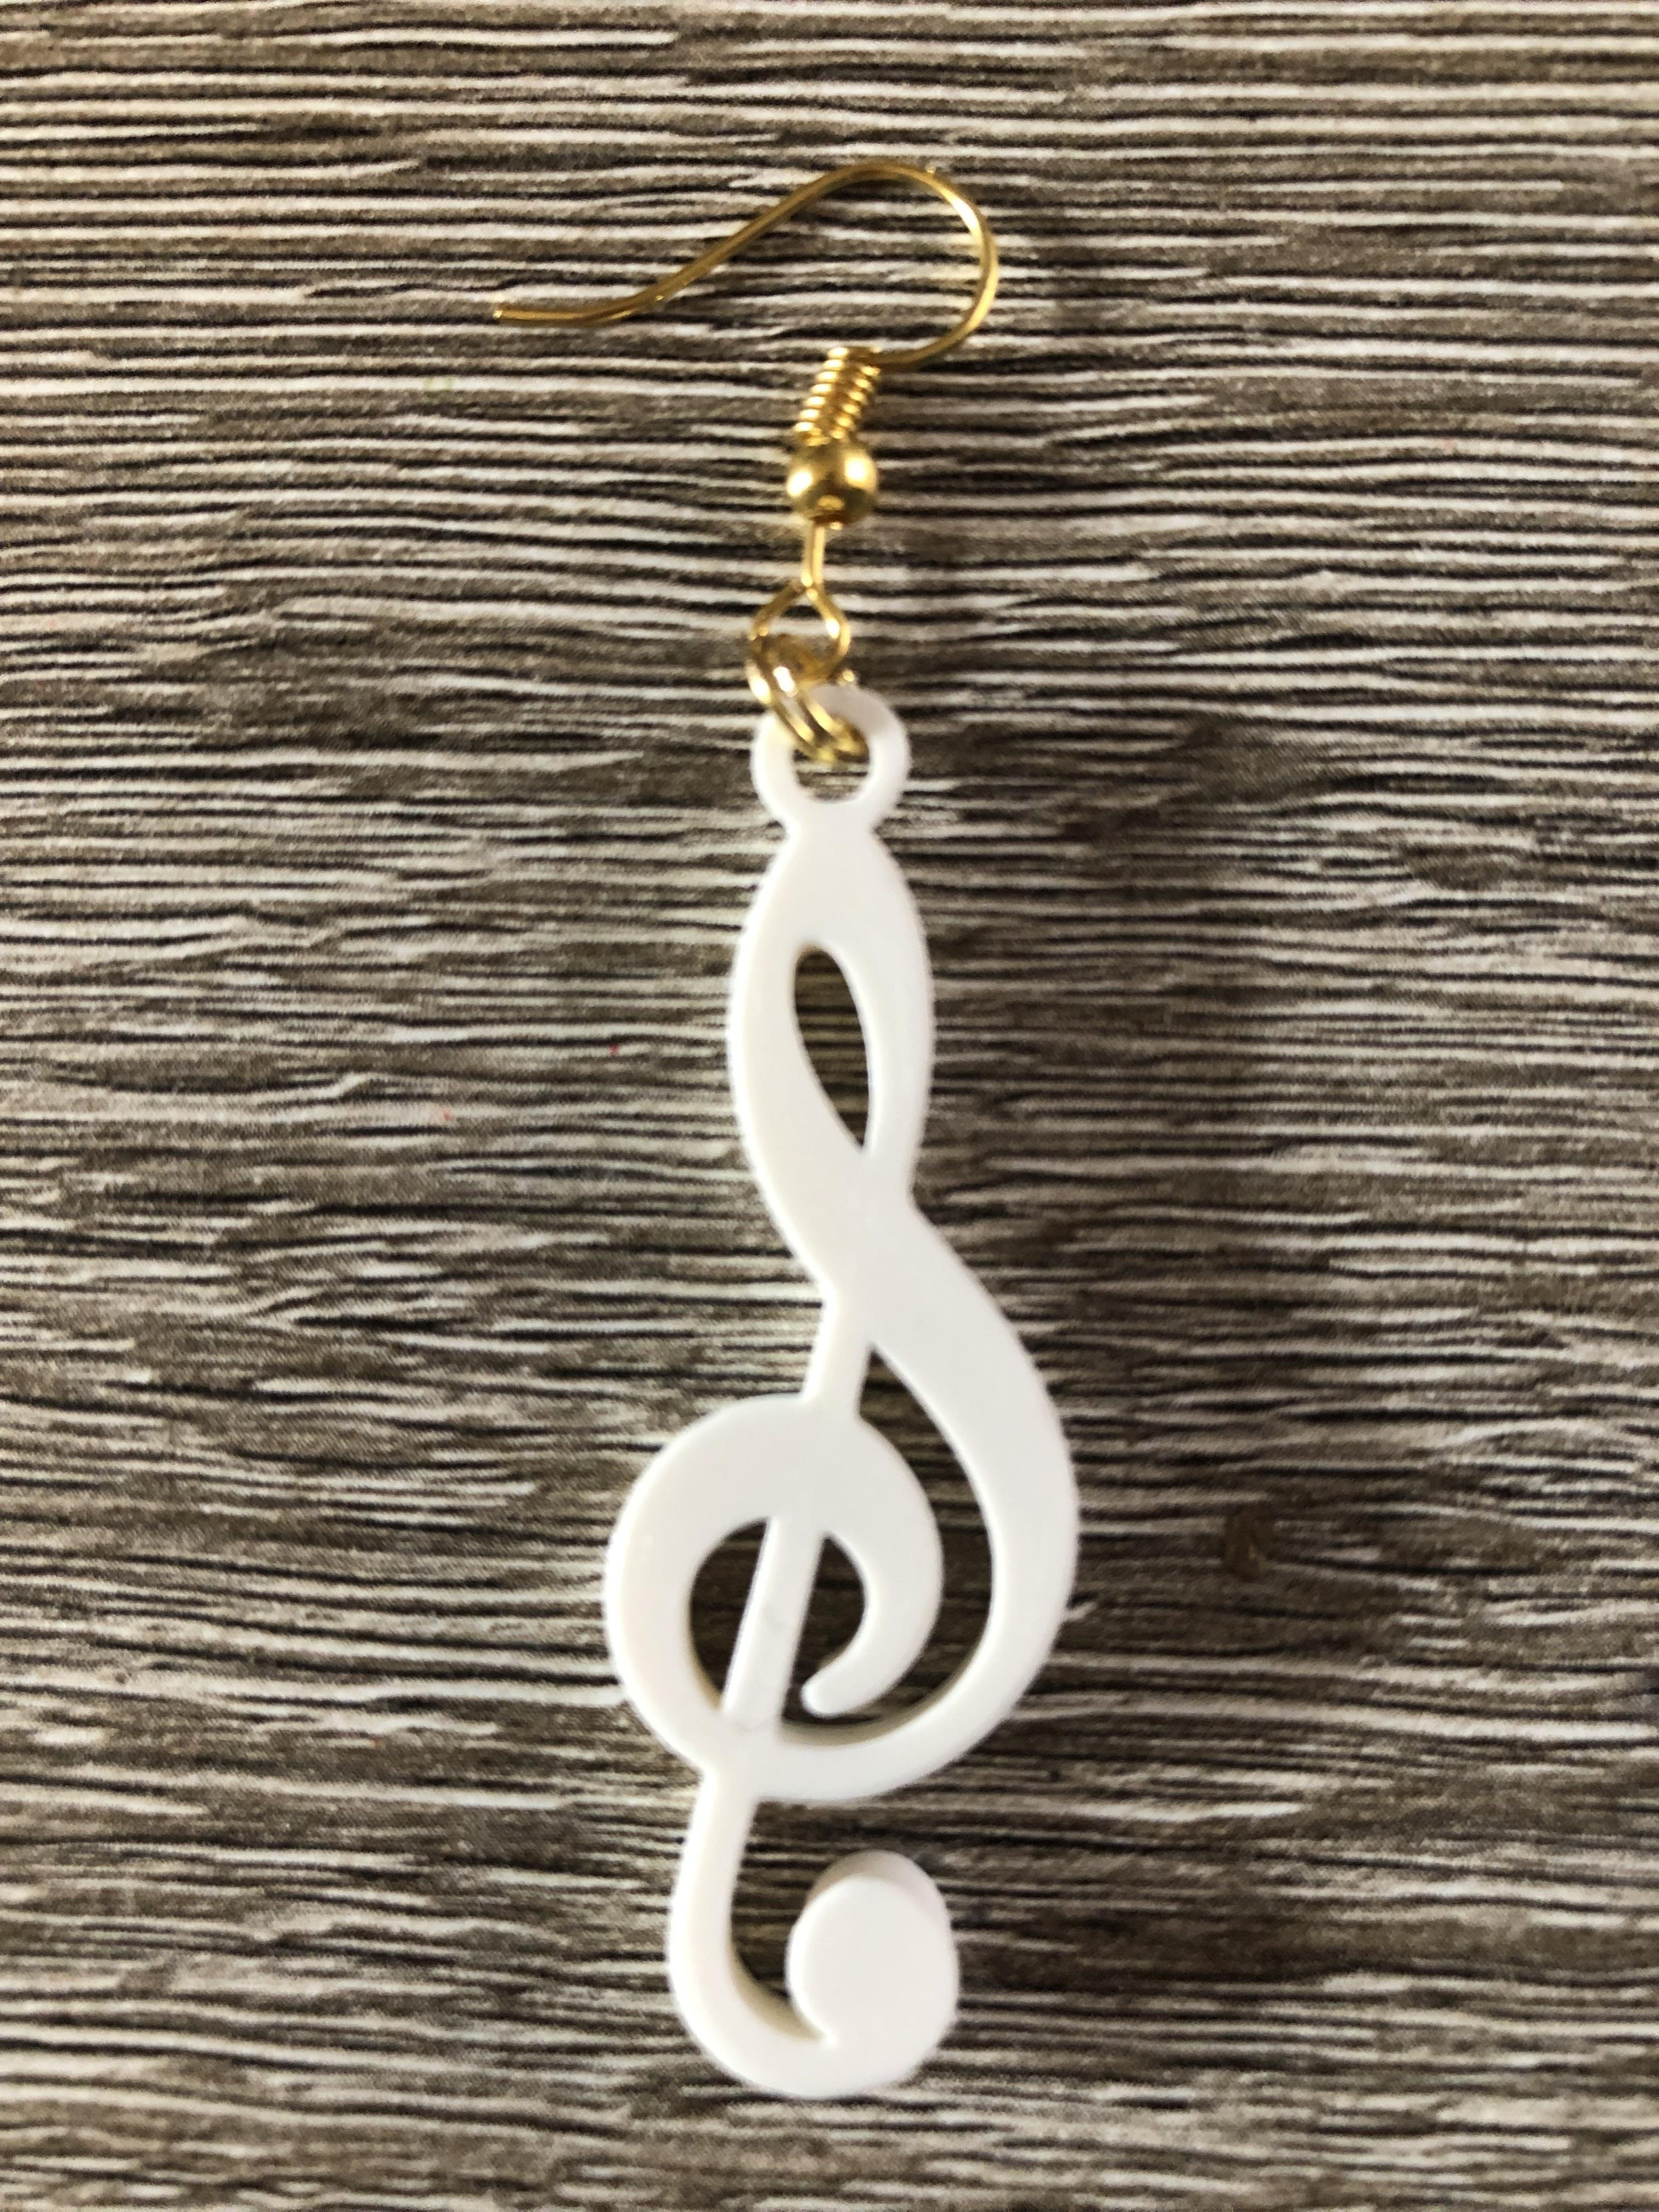 3D Printed Treble Clef Music Note Earrings